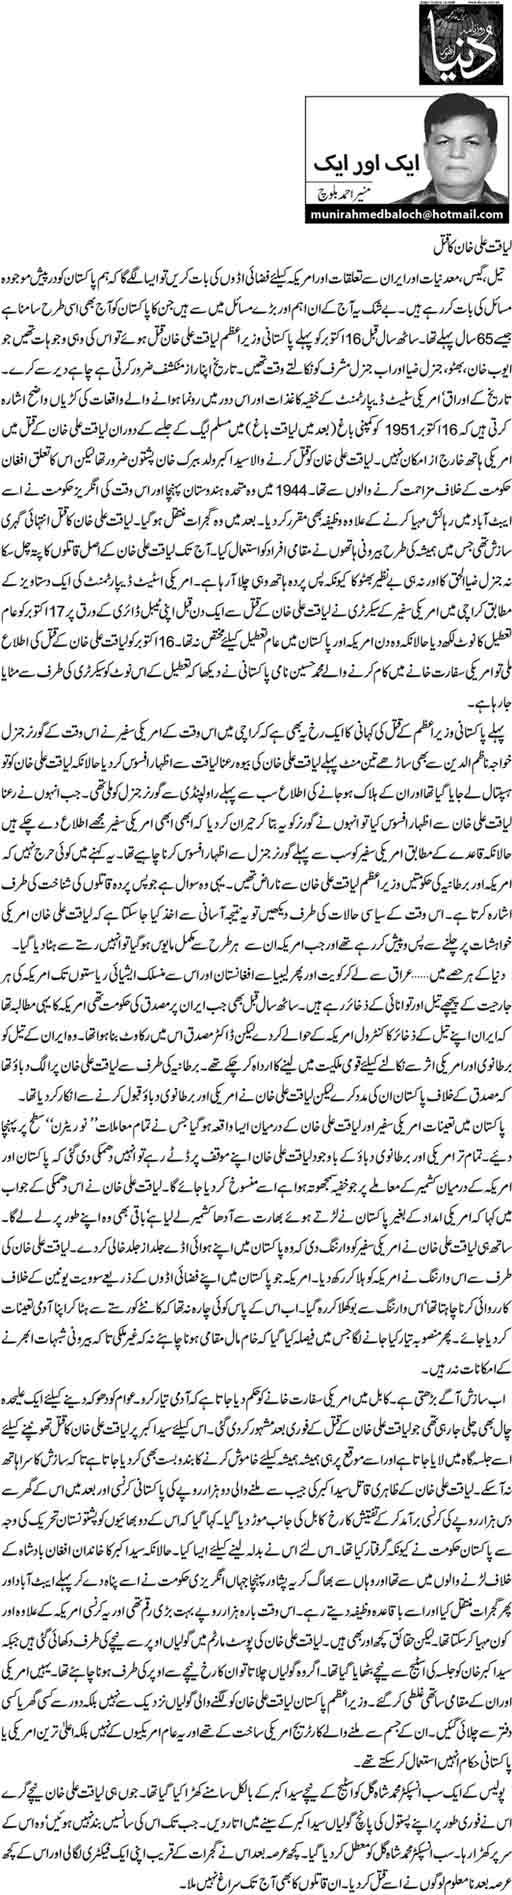 Liaqat Ali Khan ka qatal - Munir Ahmed baloch